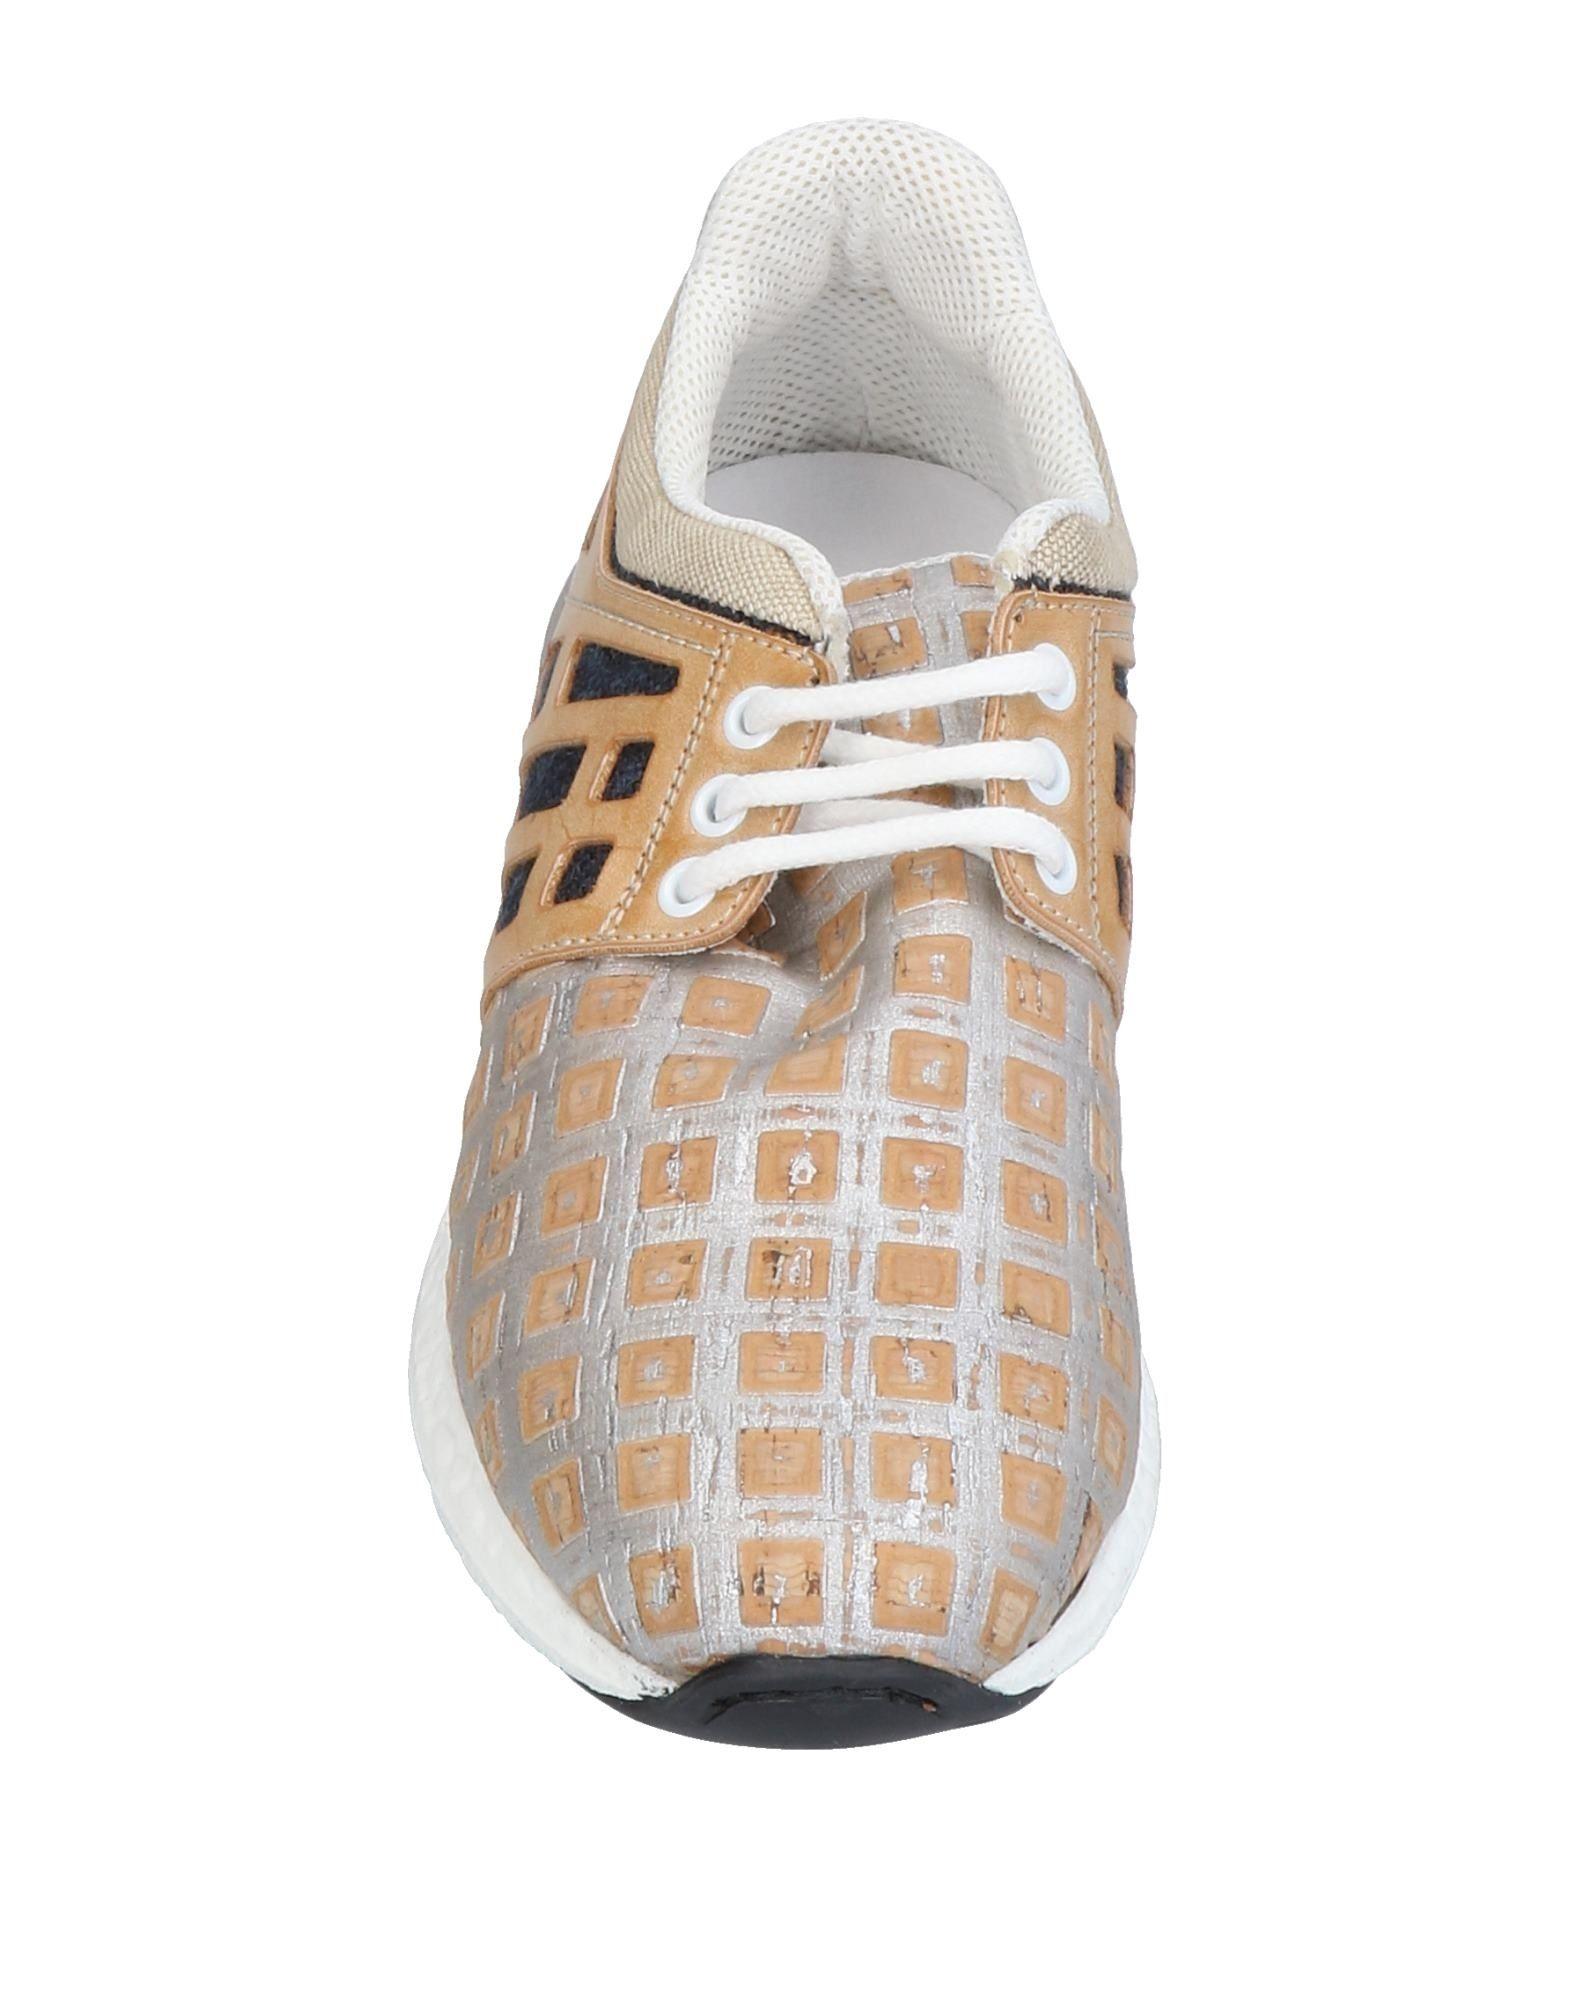 Change Sneakers Damen Qualität  11460398KG Gute Qualität Damen beliebte Schuhe f4776e